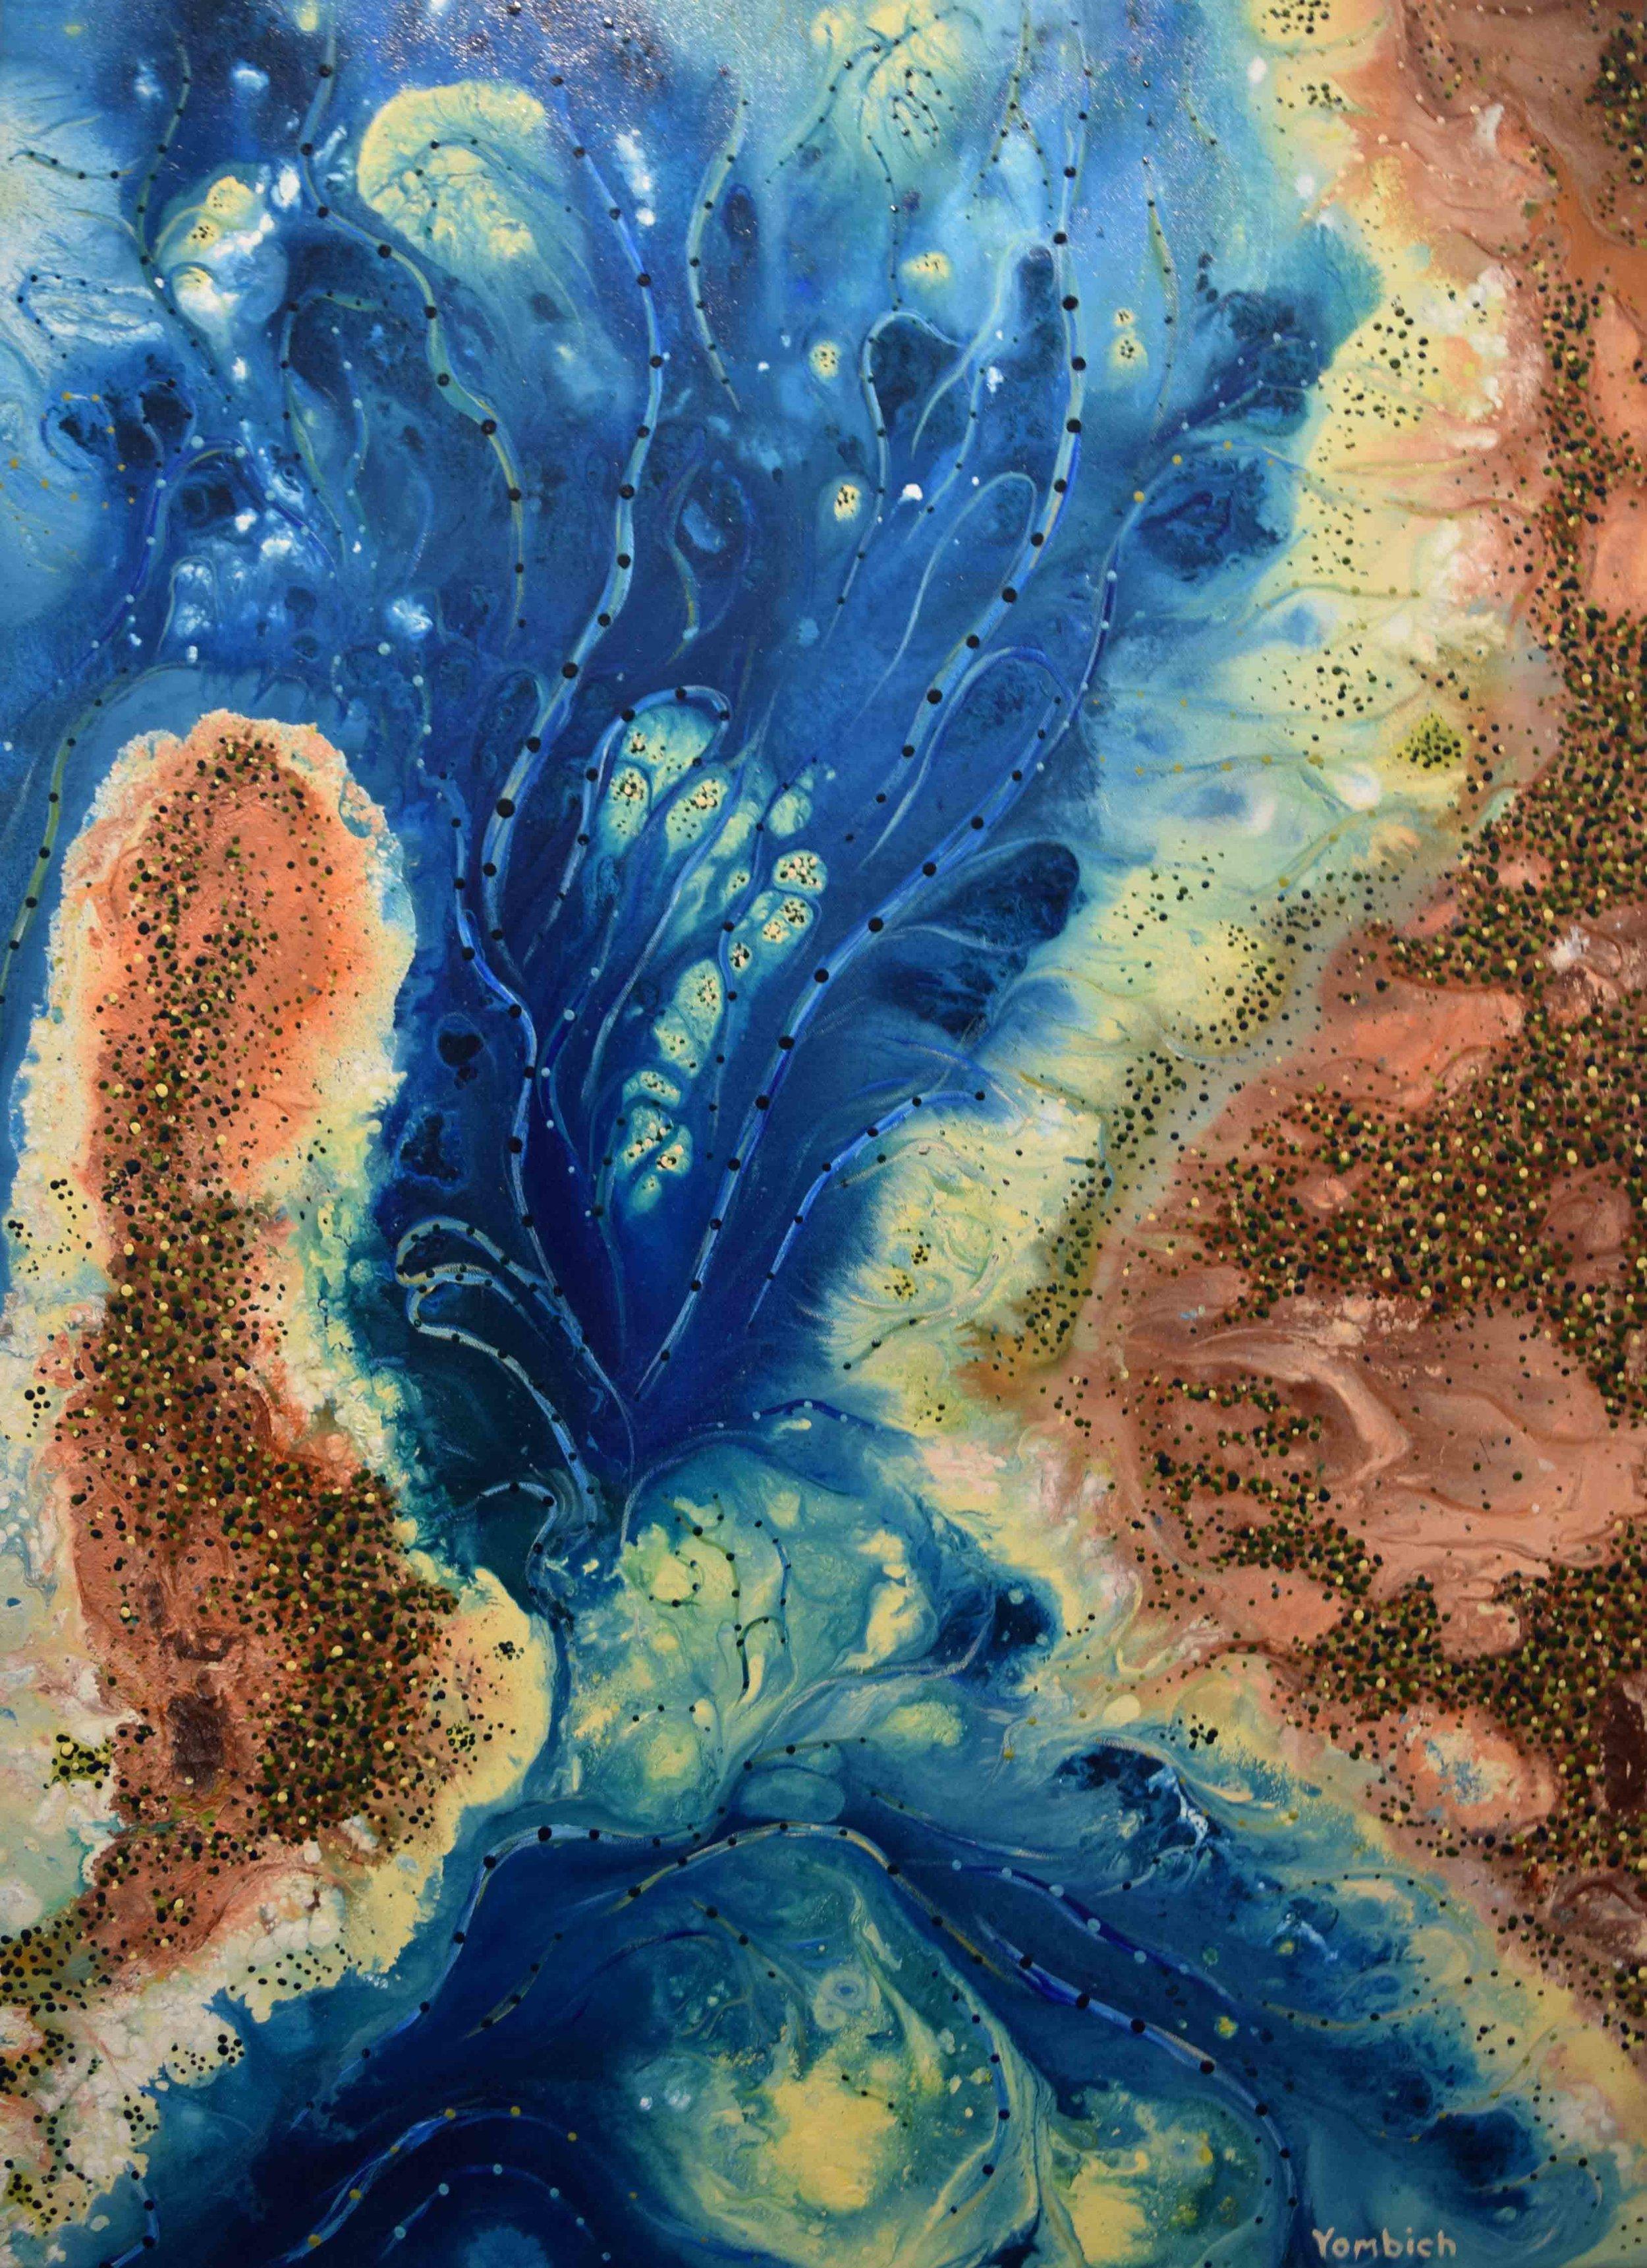 8. Bradley Kickett,  Shoalwater,  2019, acrylic on canvas, 110 x 80 cm $2,400